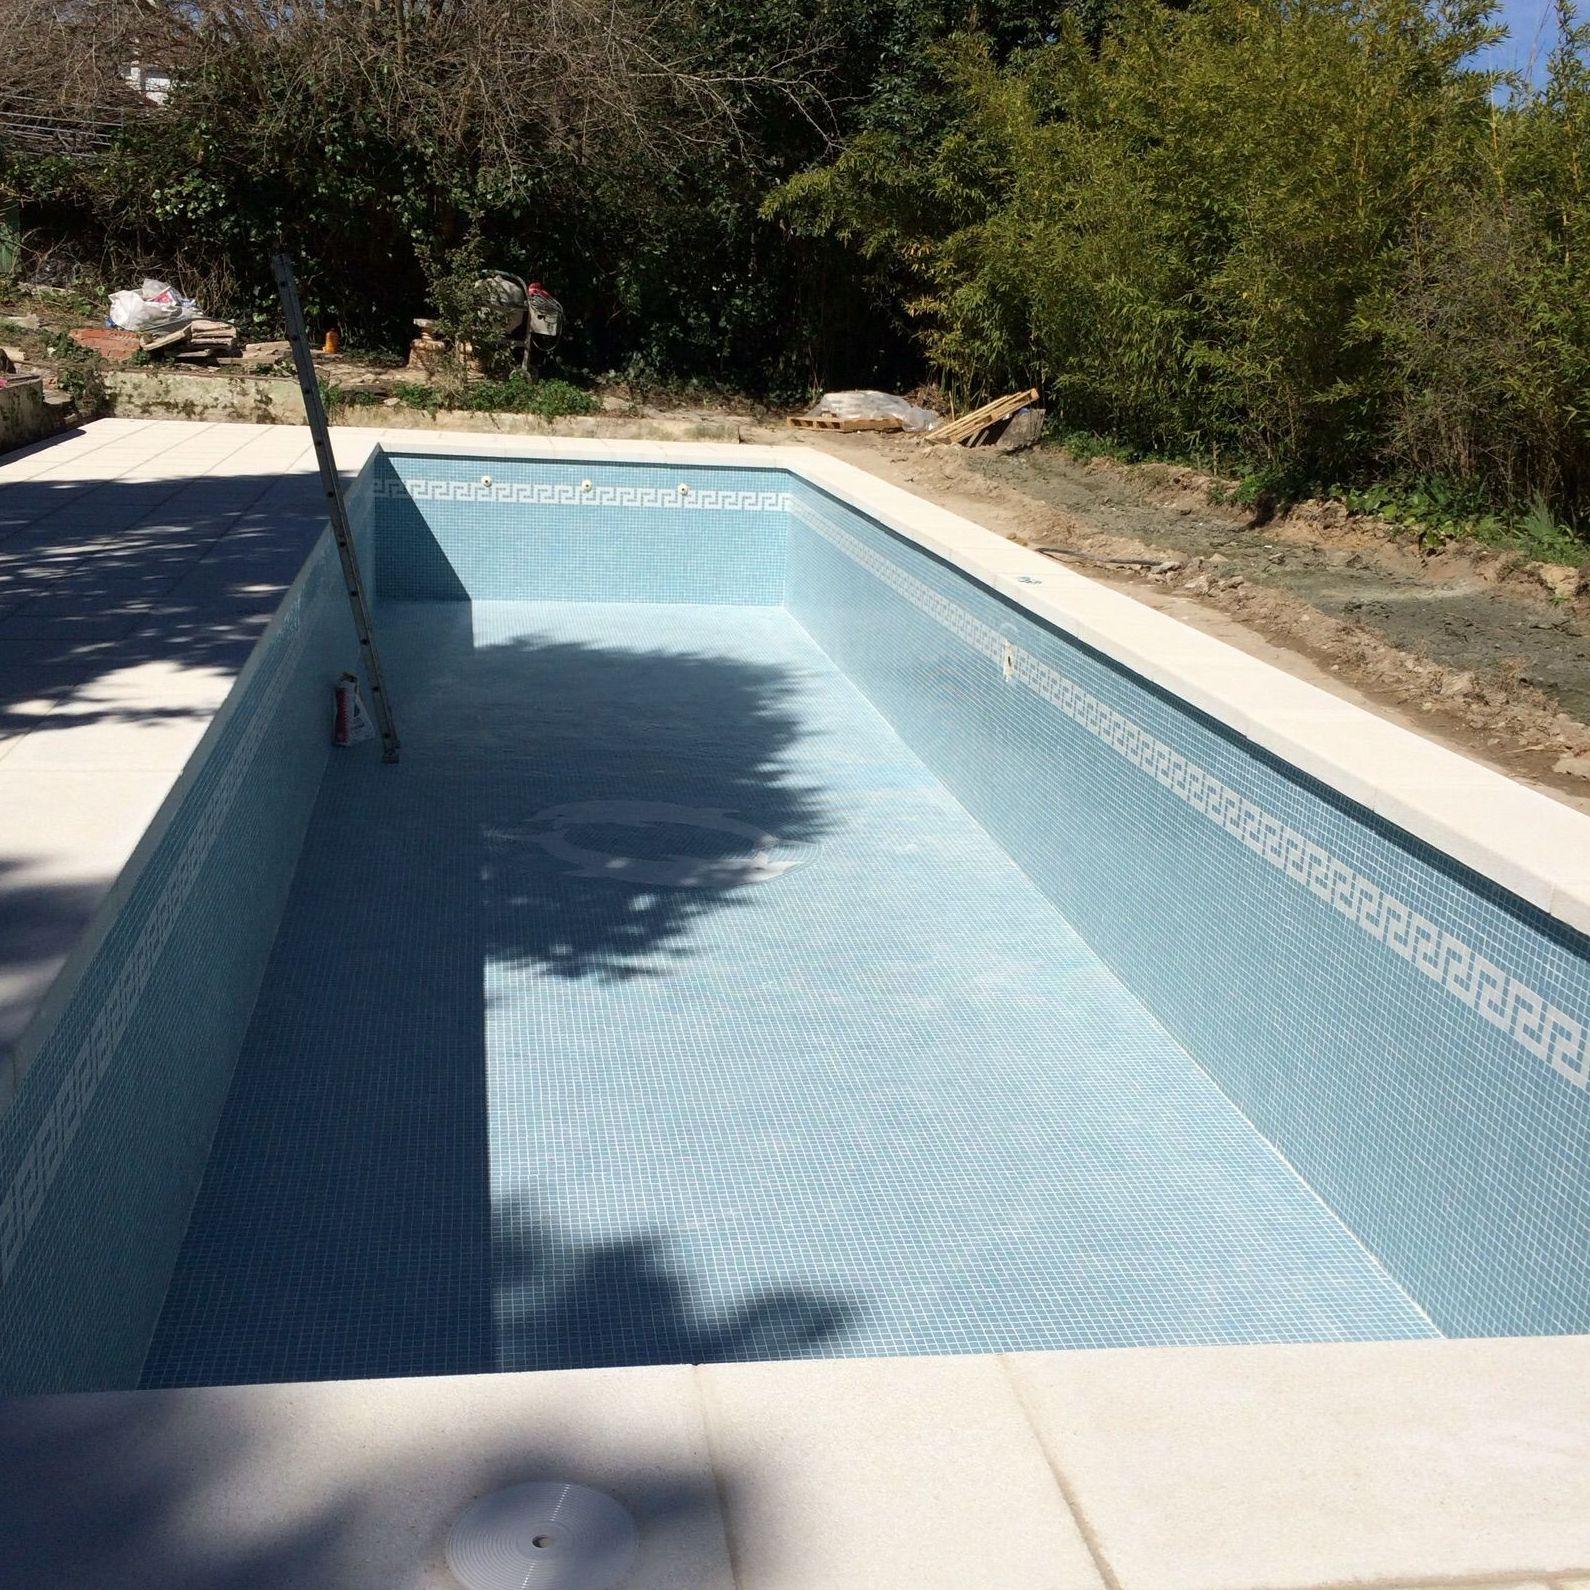 Reforma de piscina en madrid for Piscina 24 horas madrid